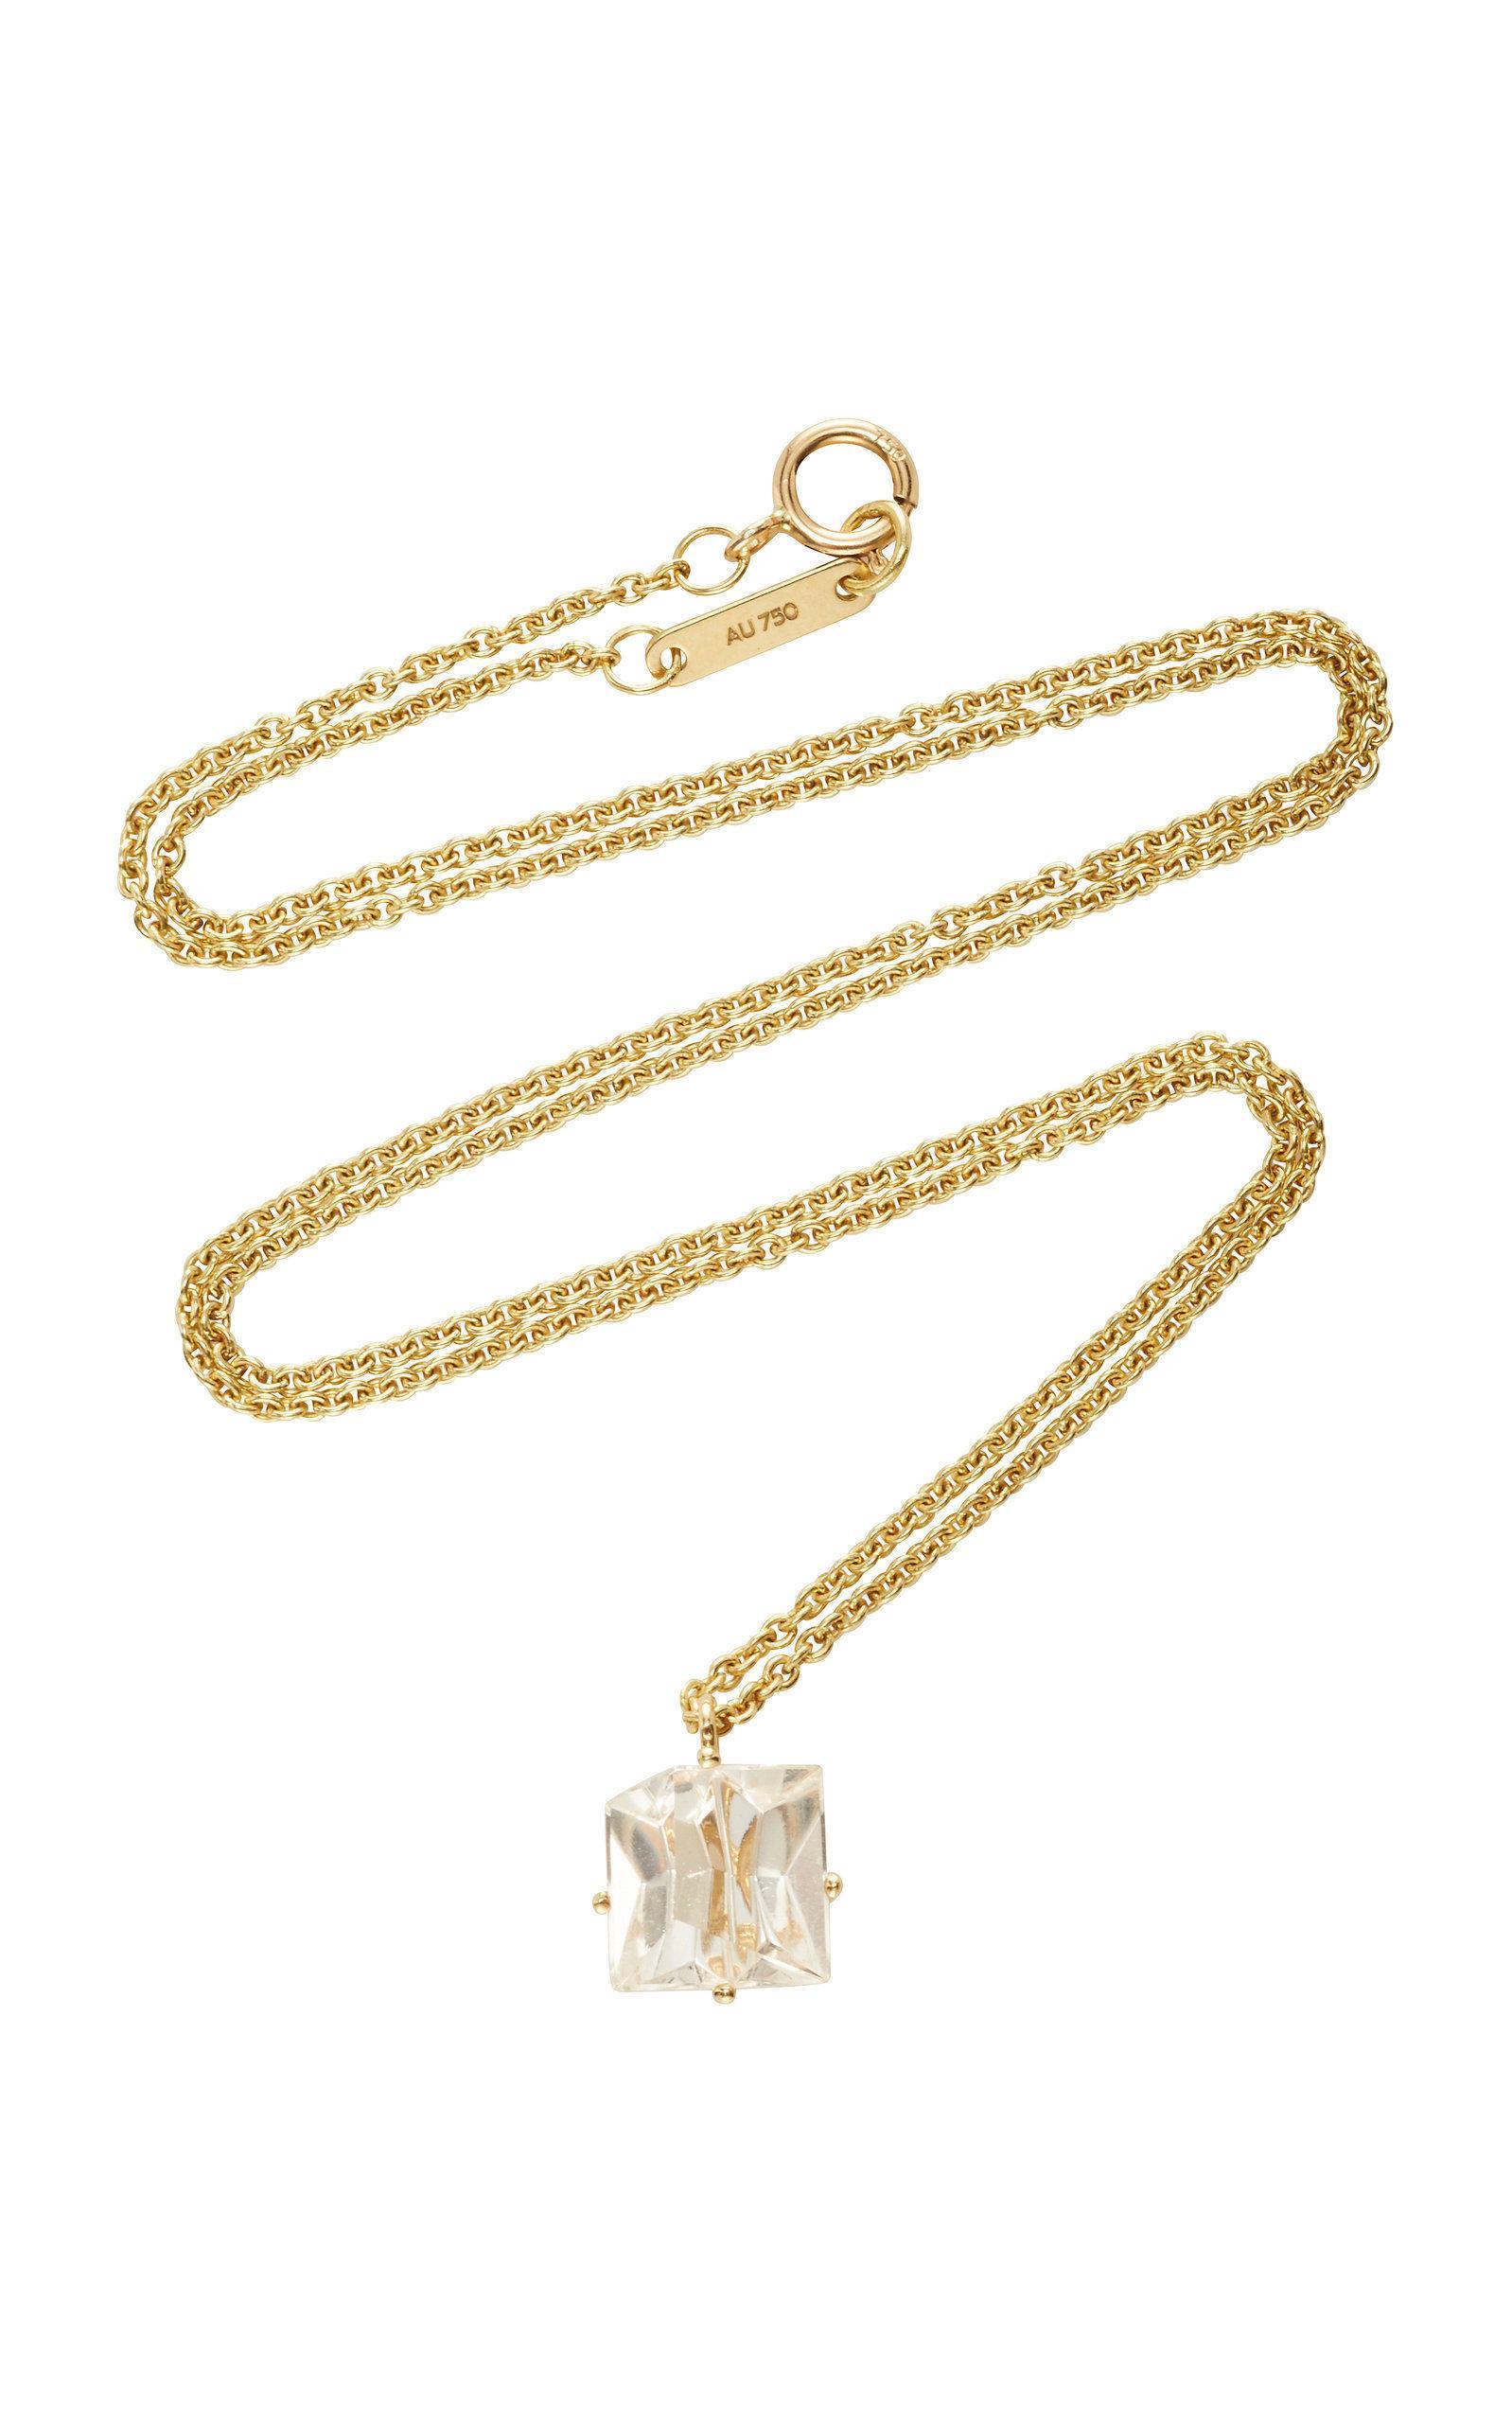 Misui 18k Gold Morganite Necklace